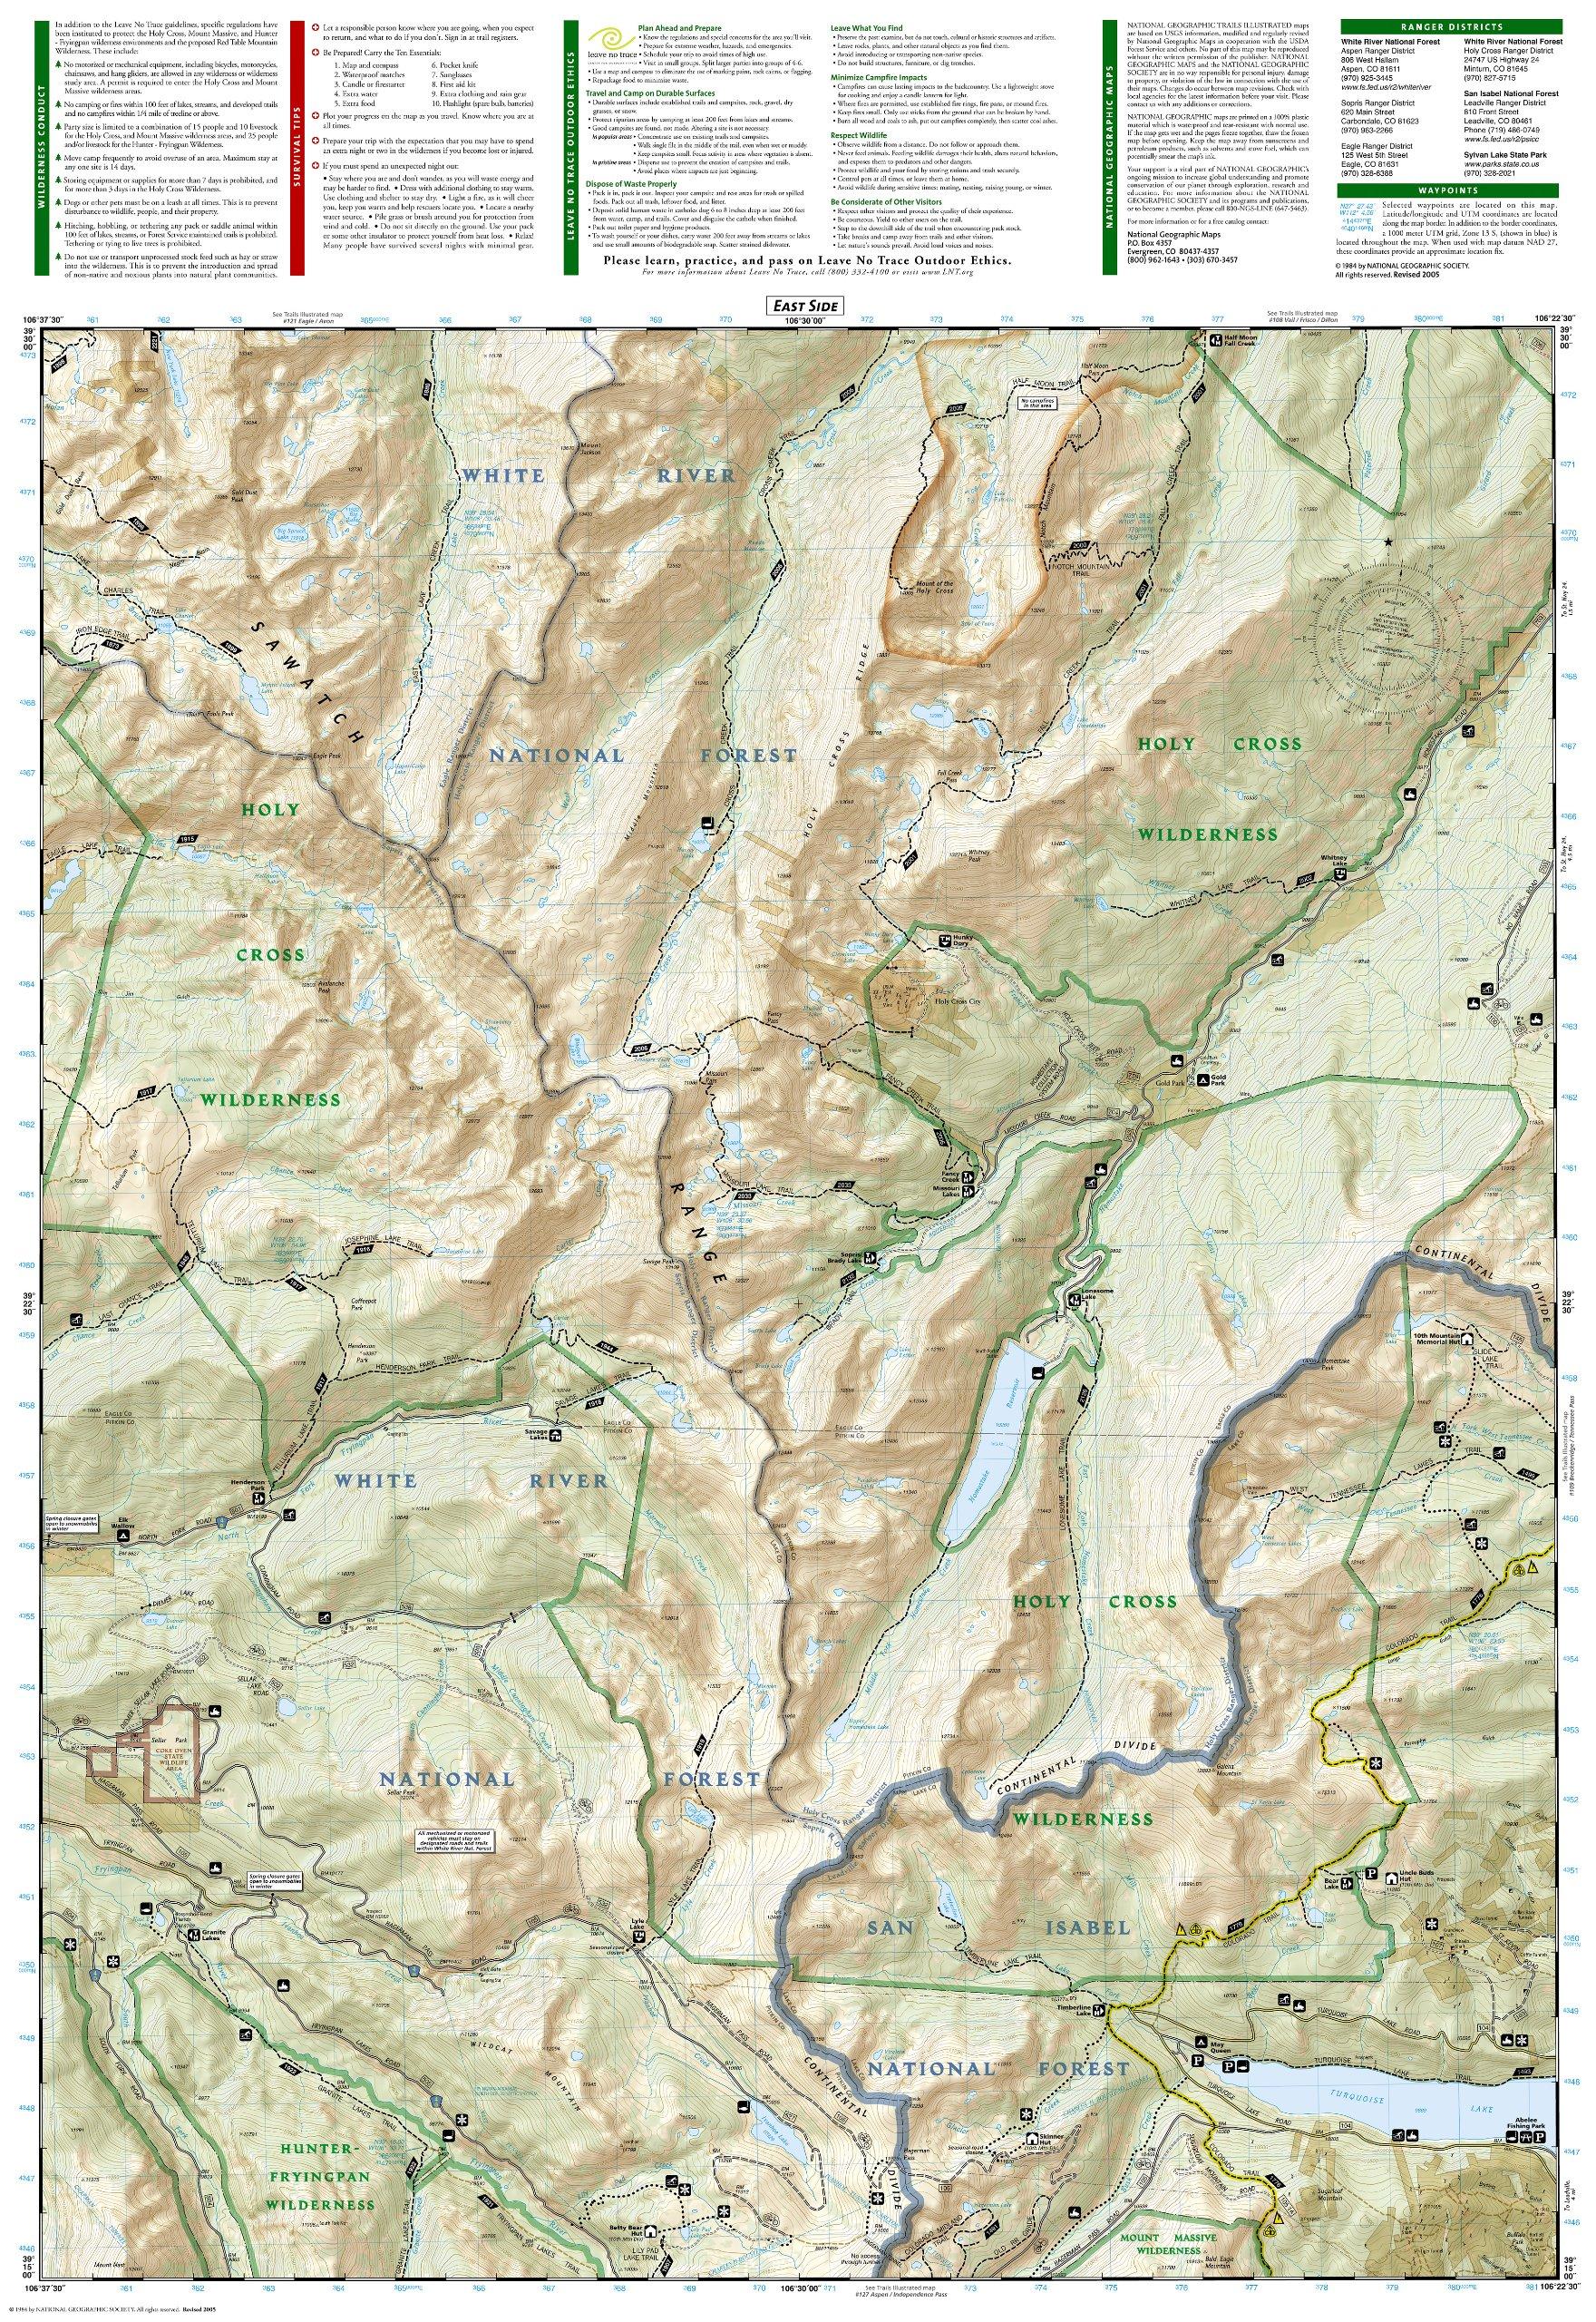 Holy Cross/Reudi Reservoir Trails Illustrated Map #126: National ...